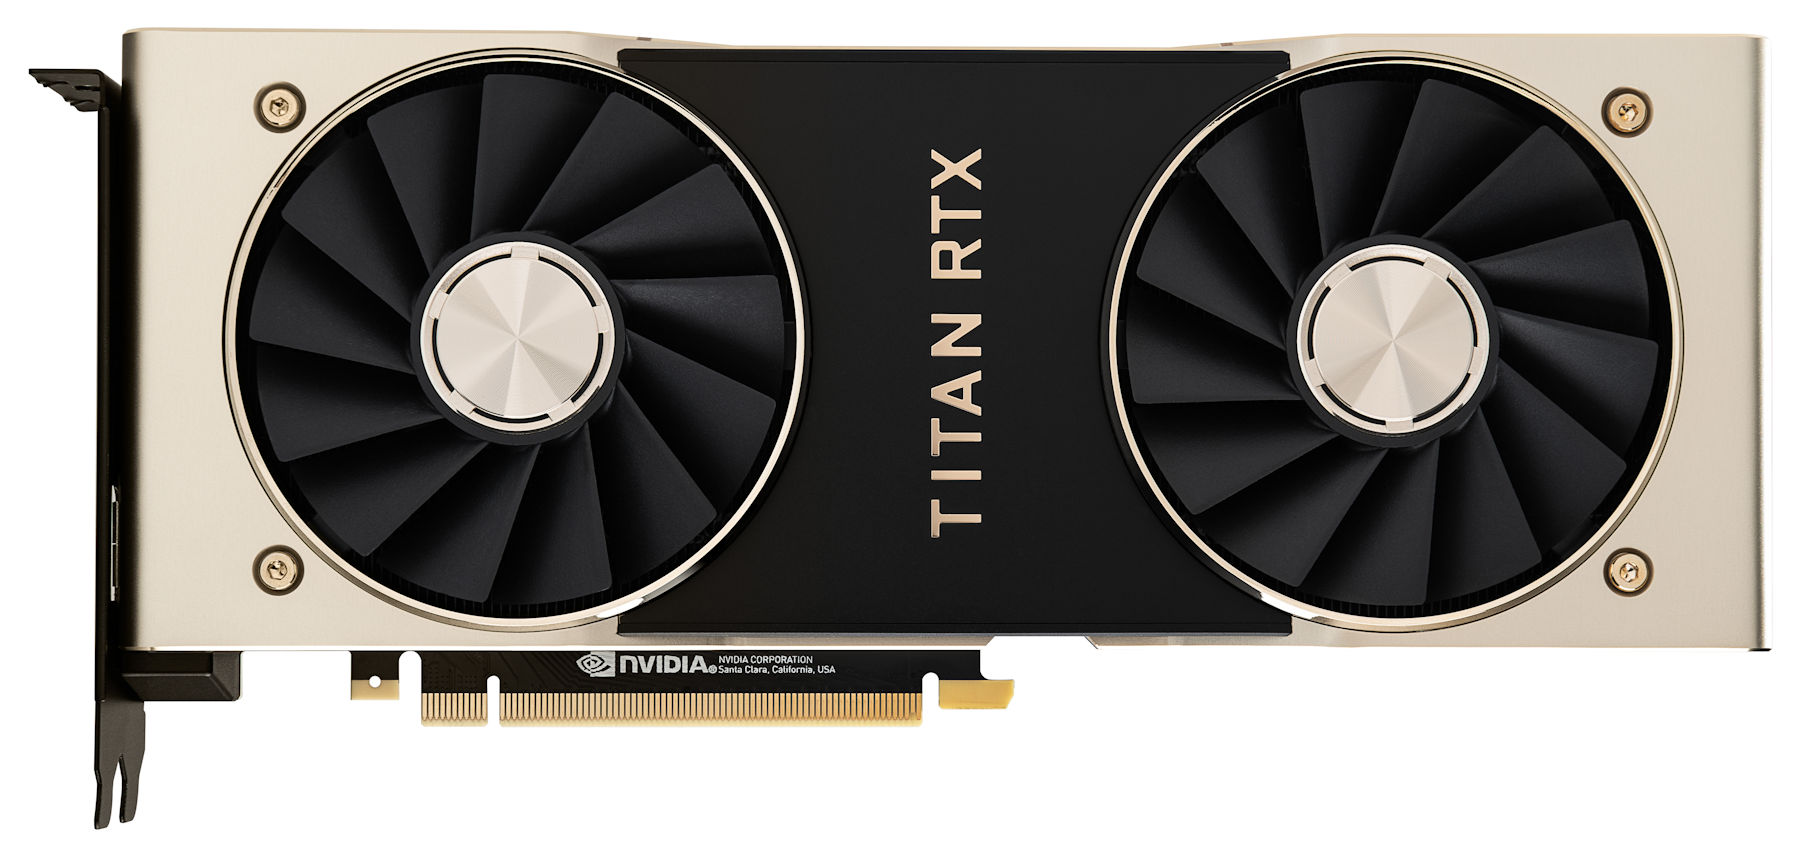 nvidia titan rtx front NVIDIA เปิดตัว NVIDIA TITAN RTX ยักษ์ใหญ่ในสถาปัตย์ Turing ตัวแรงรุ่นใหม่ล่าสุด